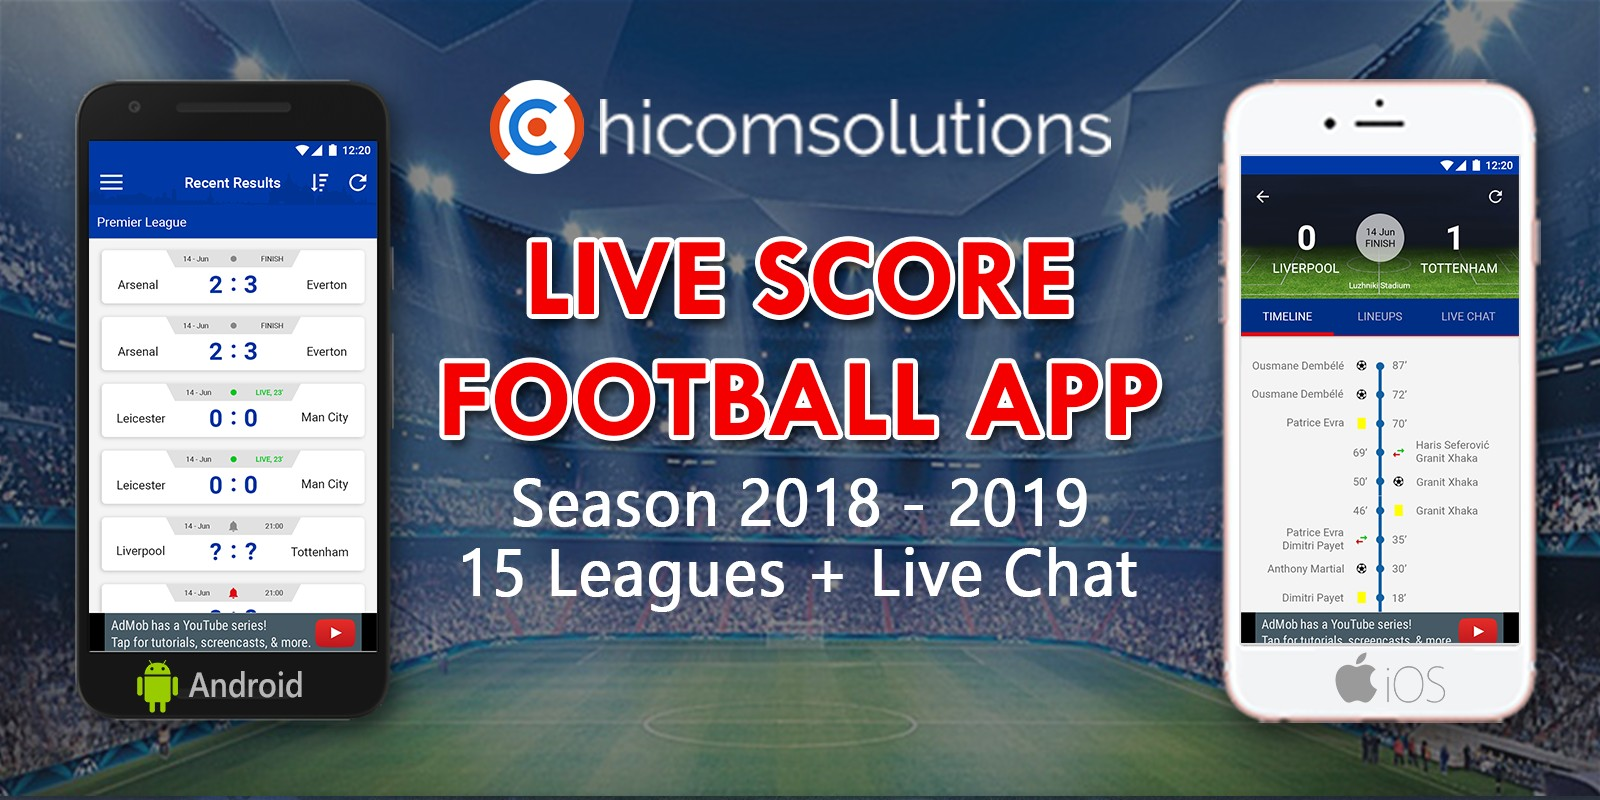 Live Score Football App Season 2018-19 For iOS